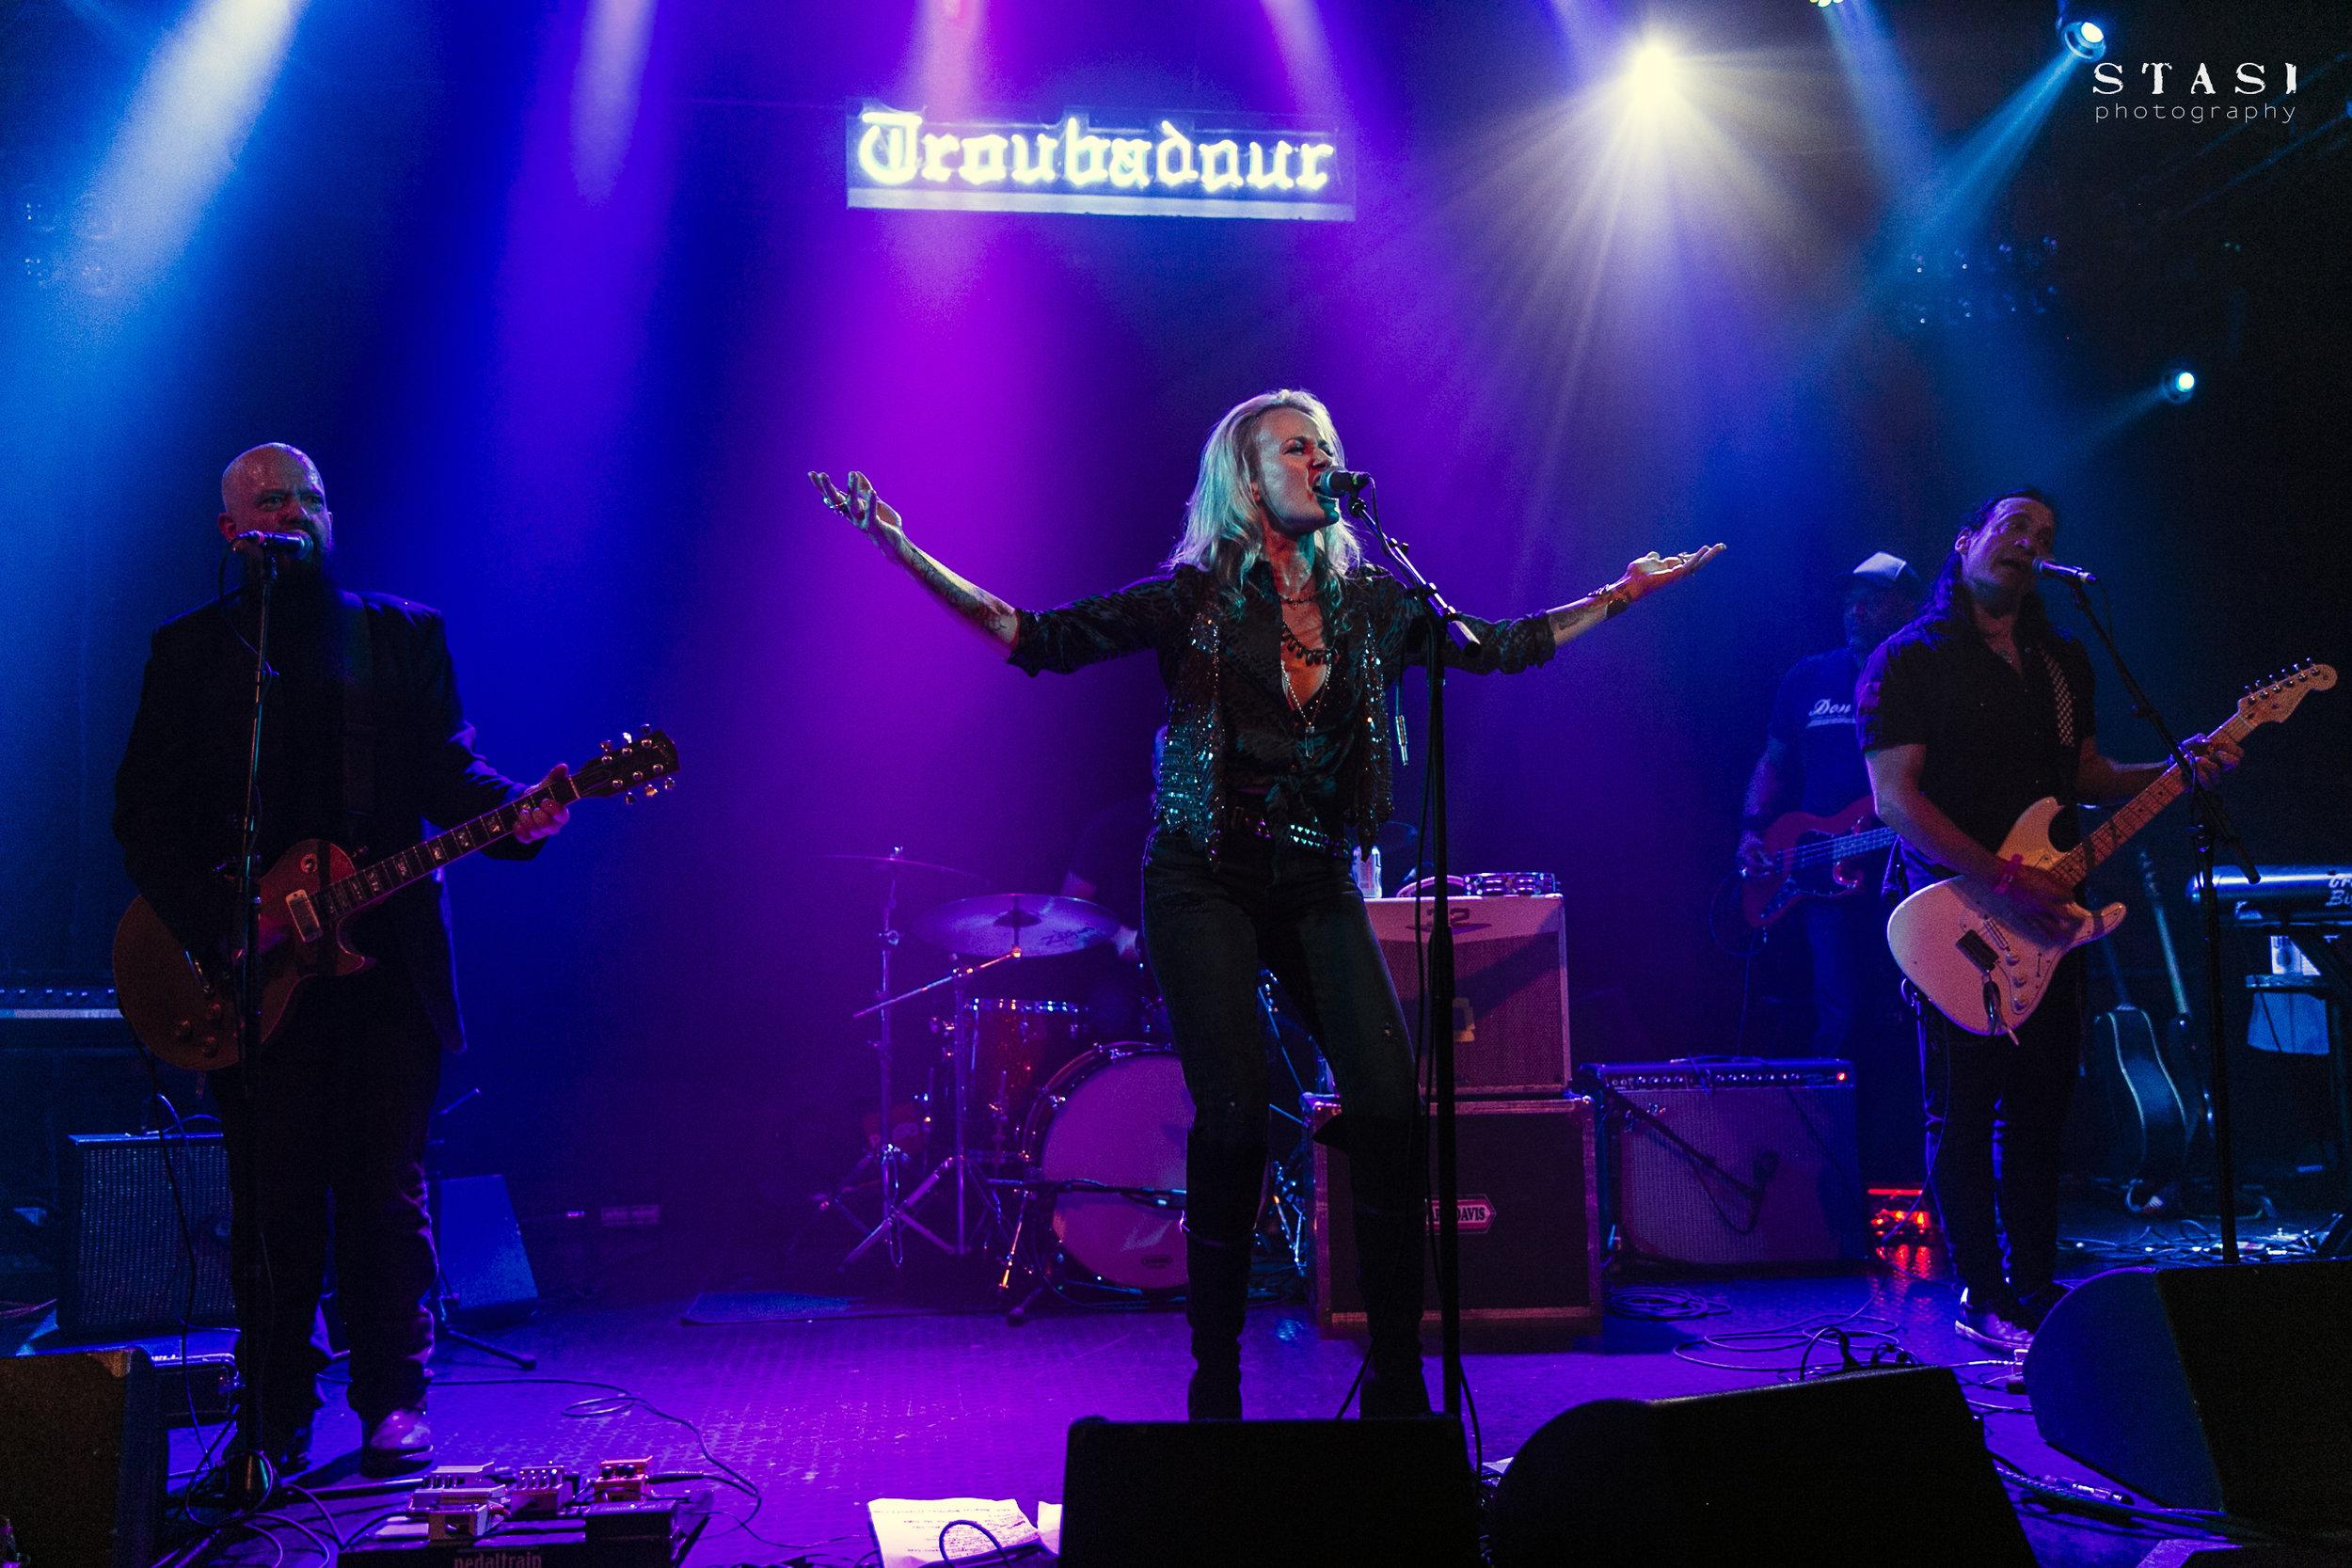 Pearl-Troubadour-MattStasi-0166.jpg